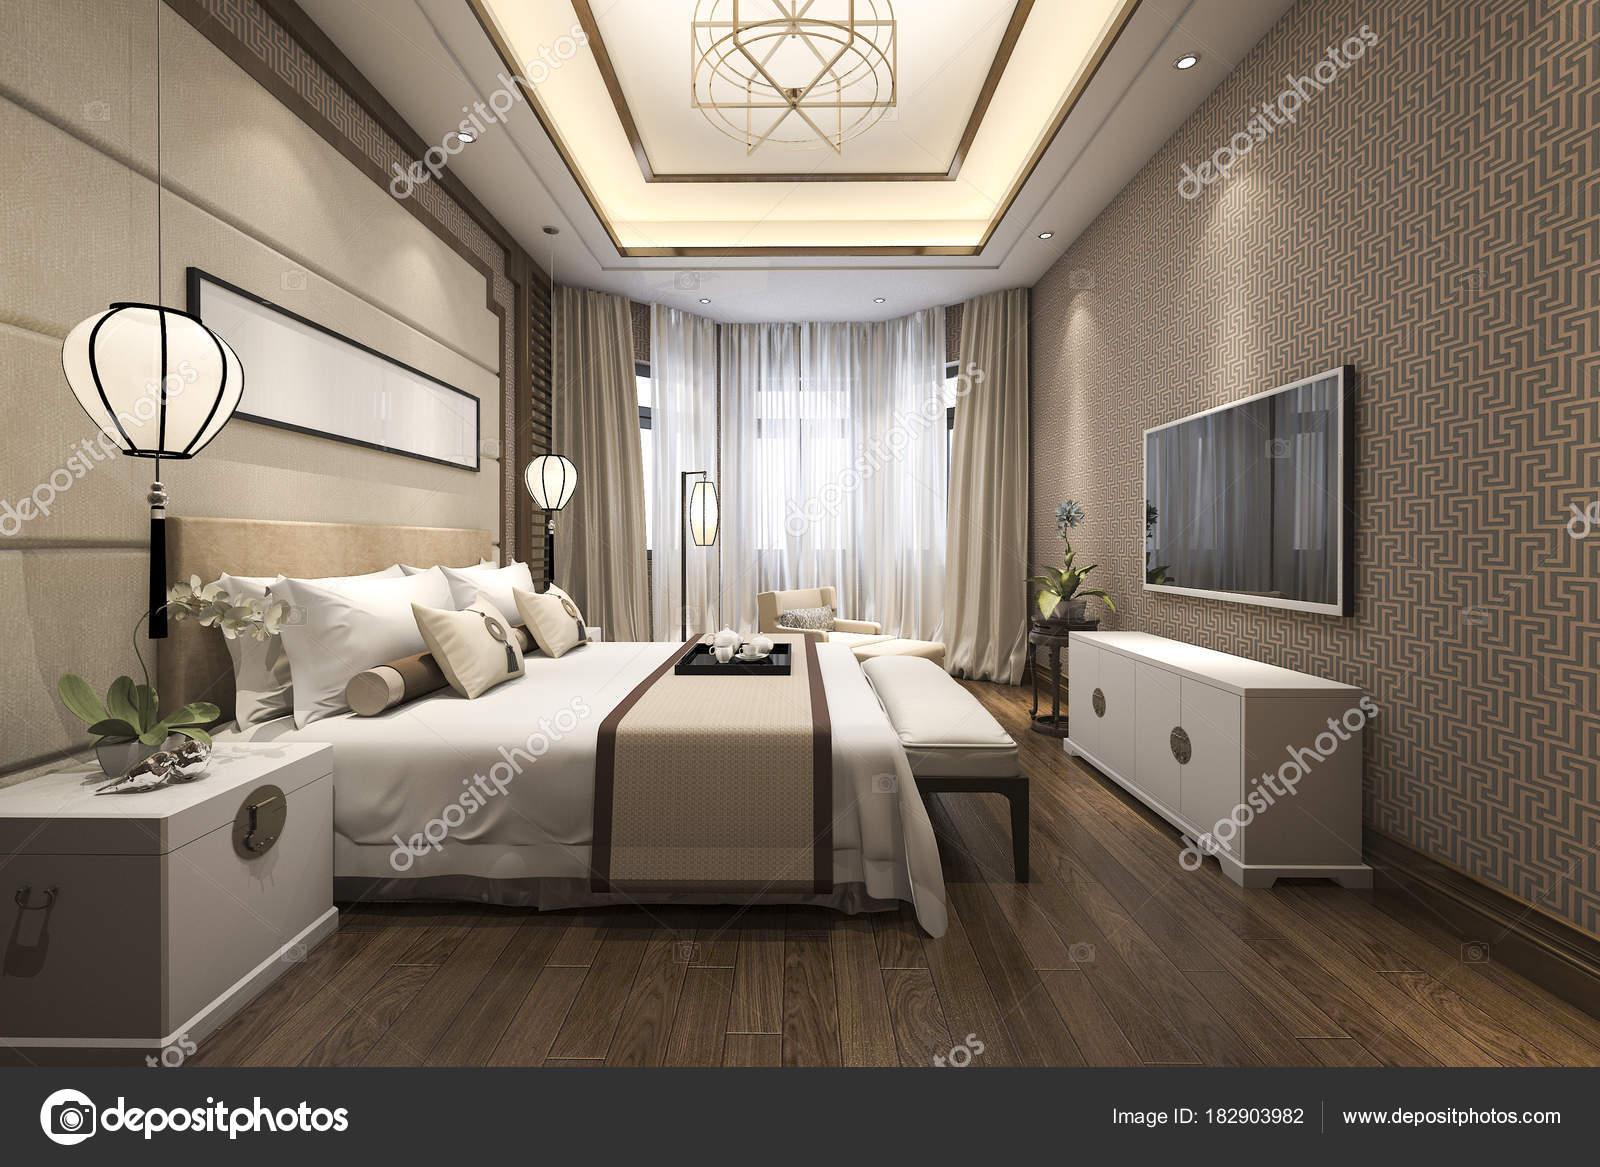 https://st3.depositphotos.com/11352286/18290/i/1600/depositphotos_182903982-stock-photo-rendering-modern-luxury-classic-bedroom.jpg